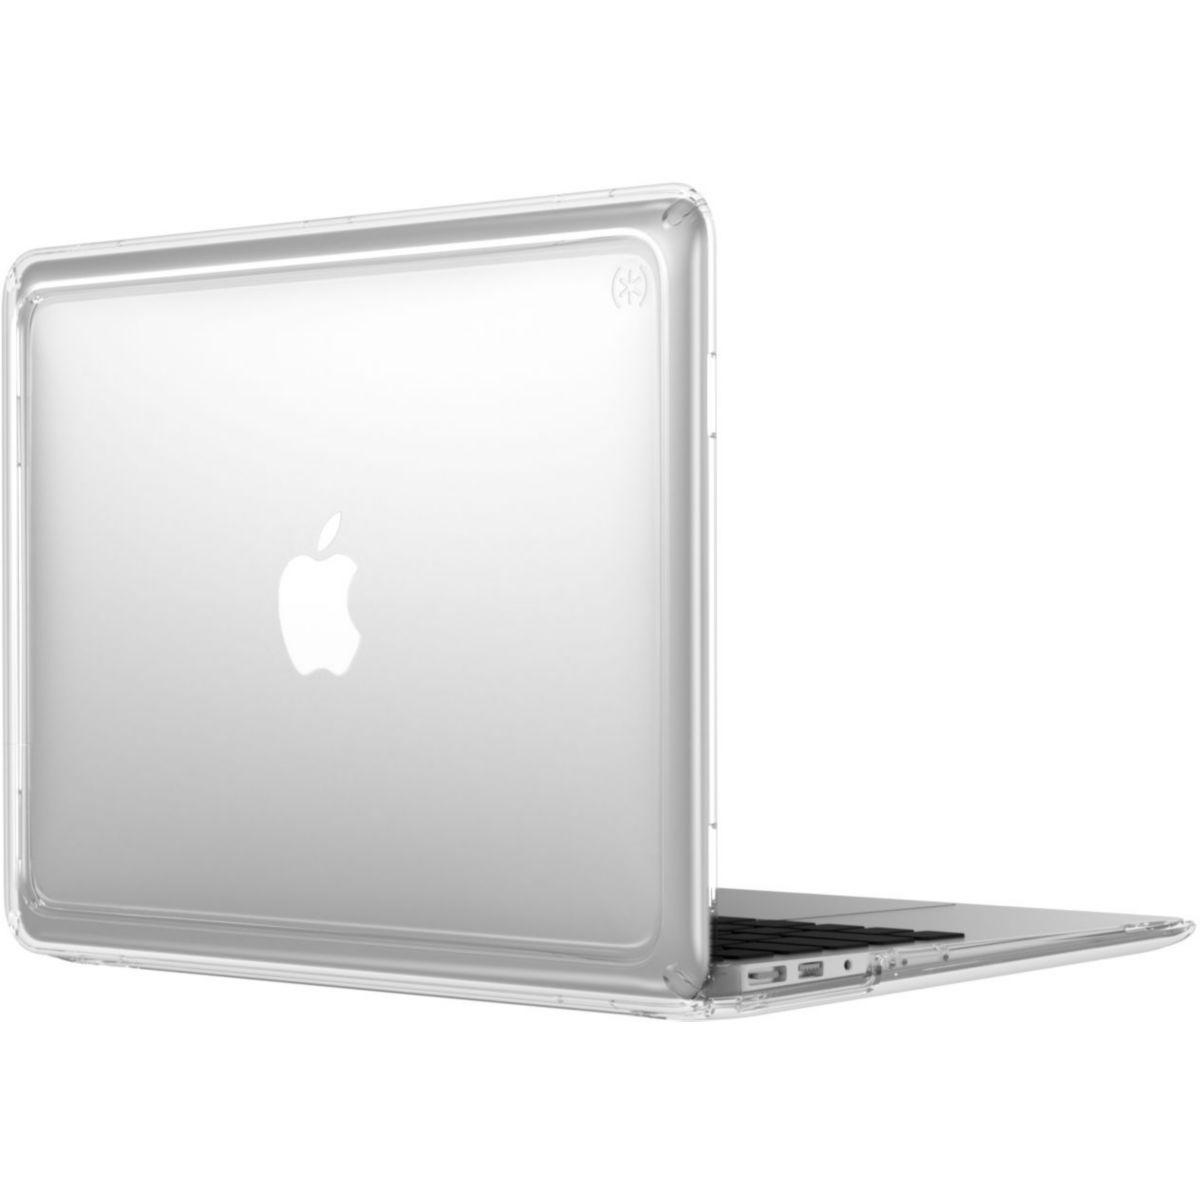 Coque speck 'macbook pro 13' tb presidio clear' - 15% de remise imm�diate avec le code :